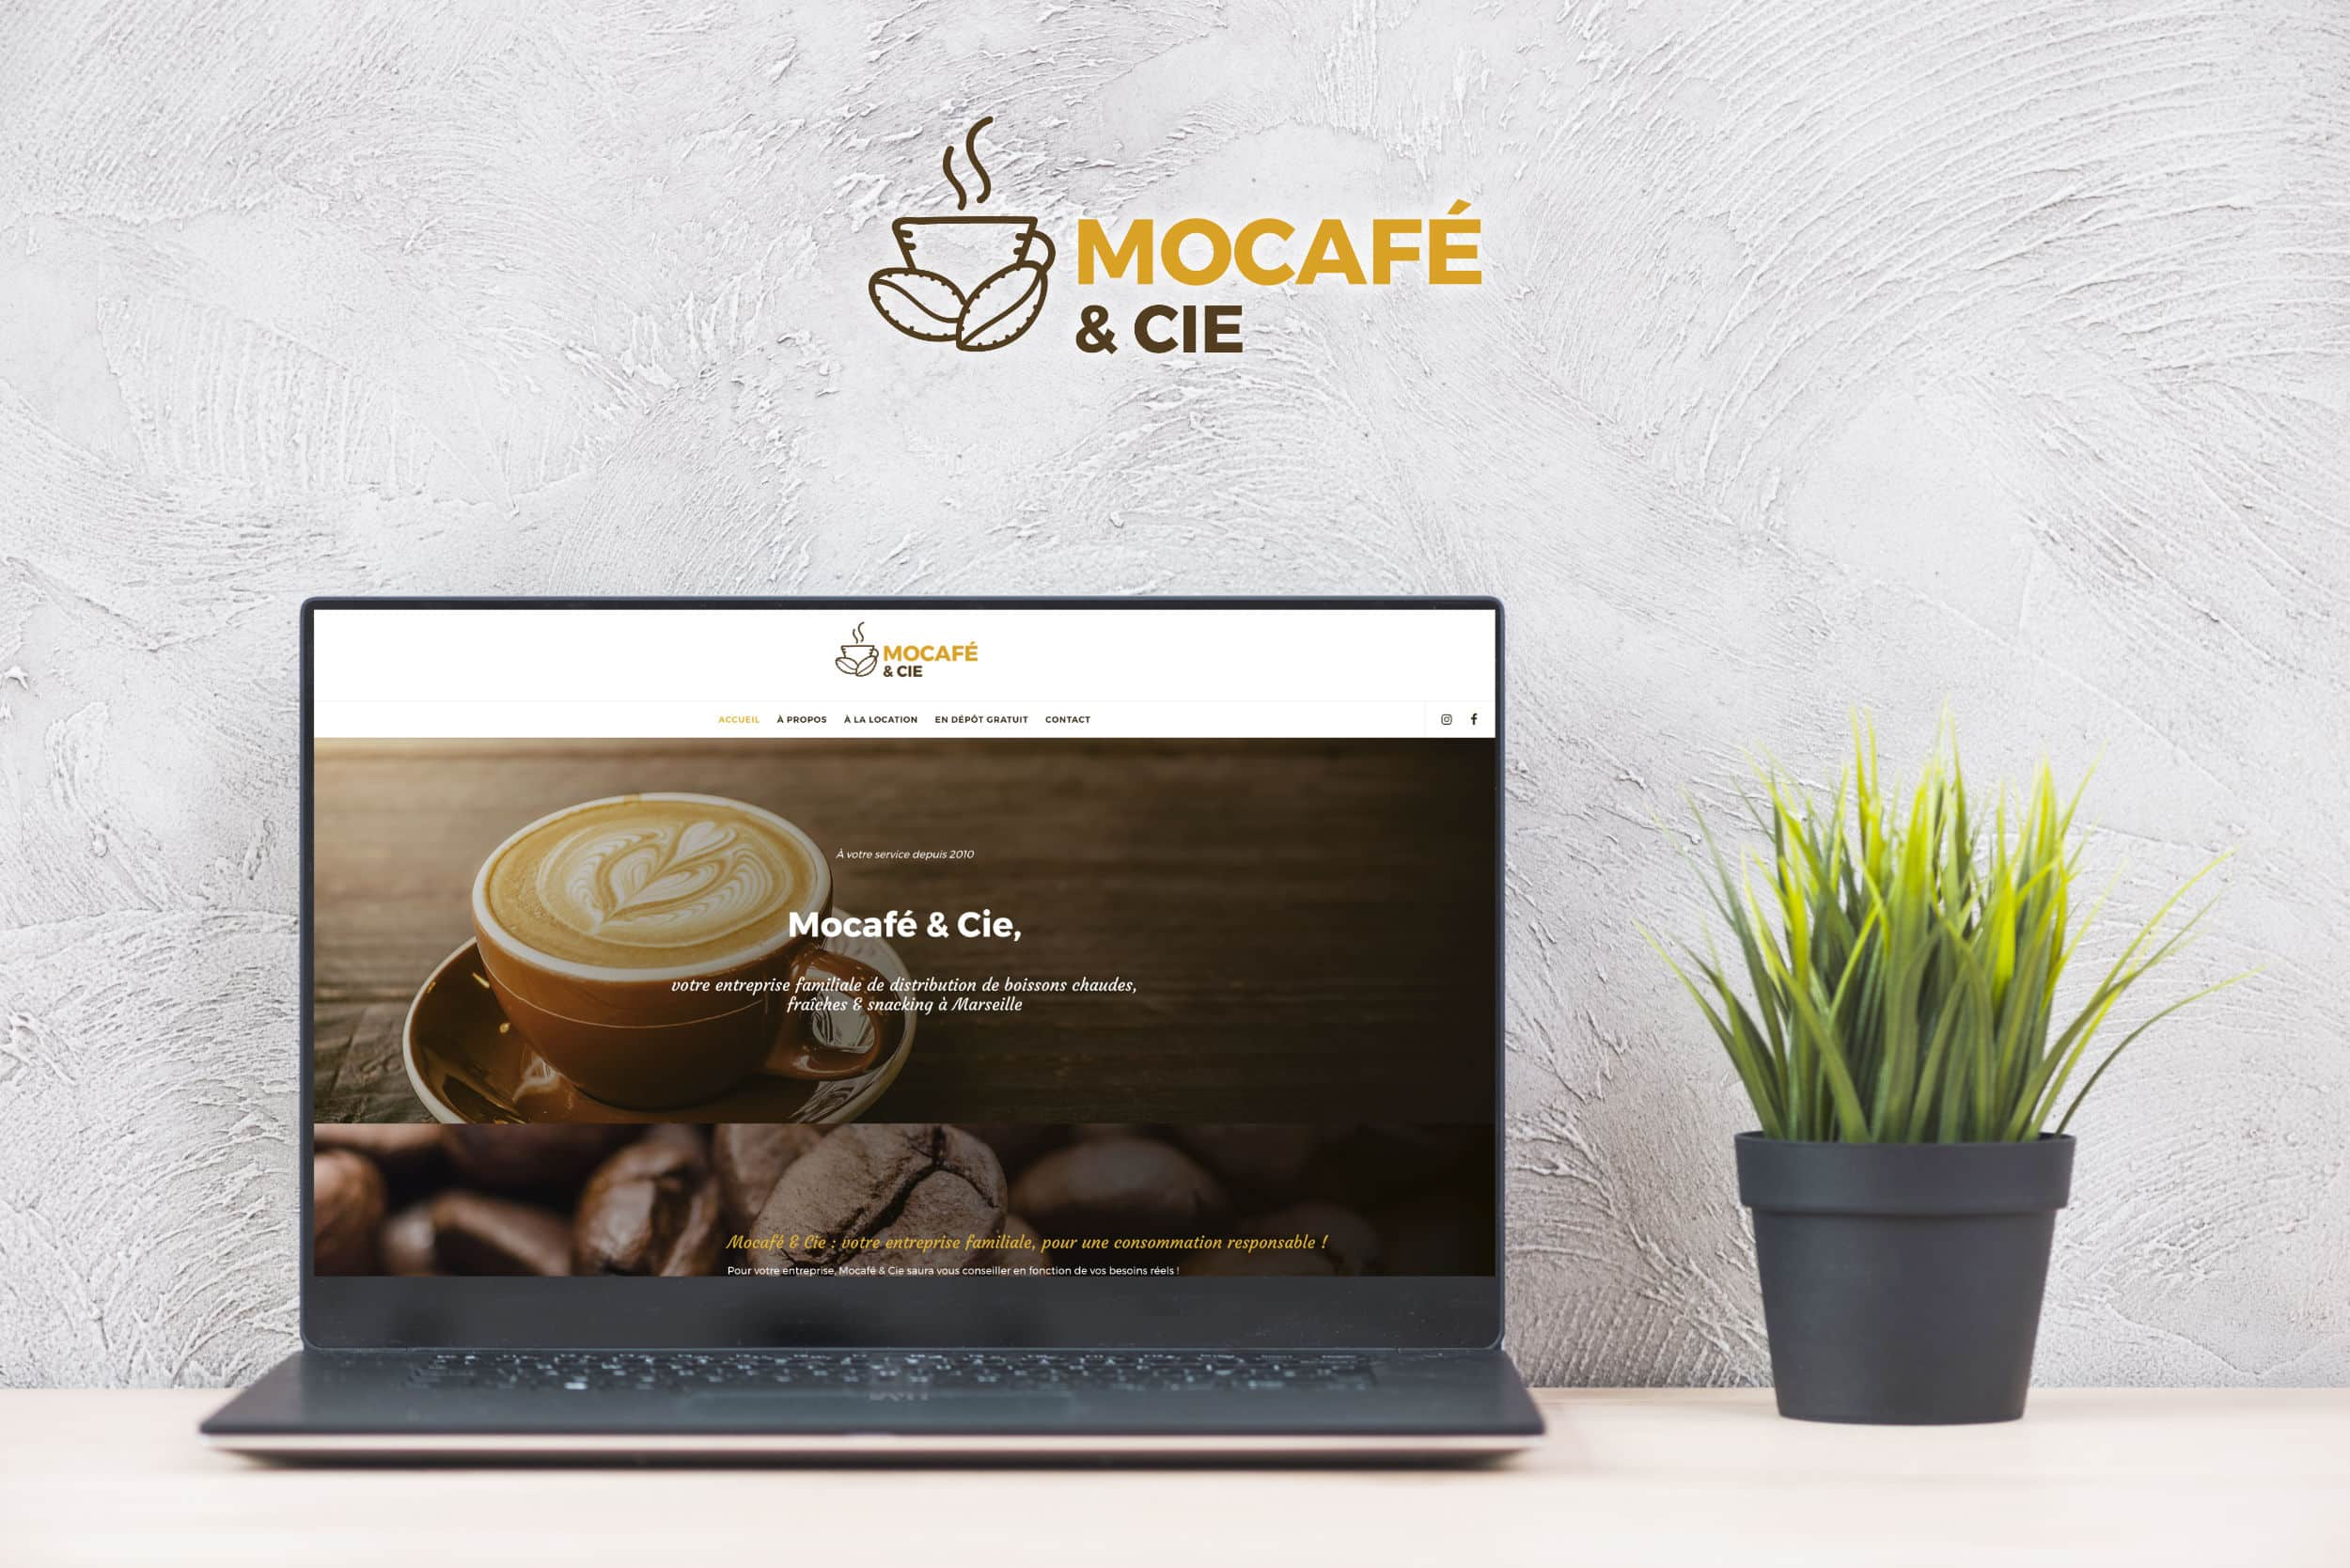 site Mocafé & Cie